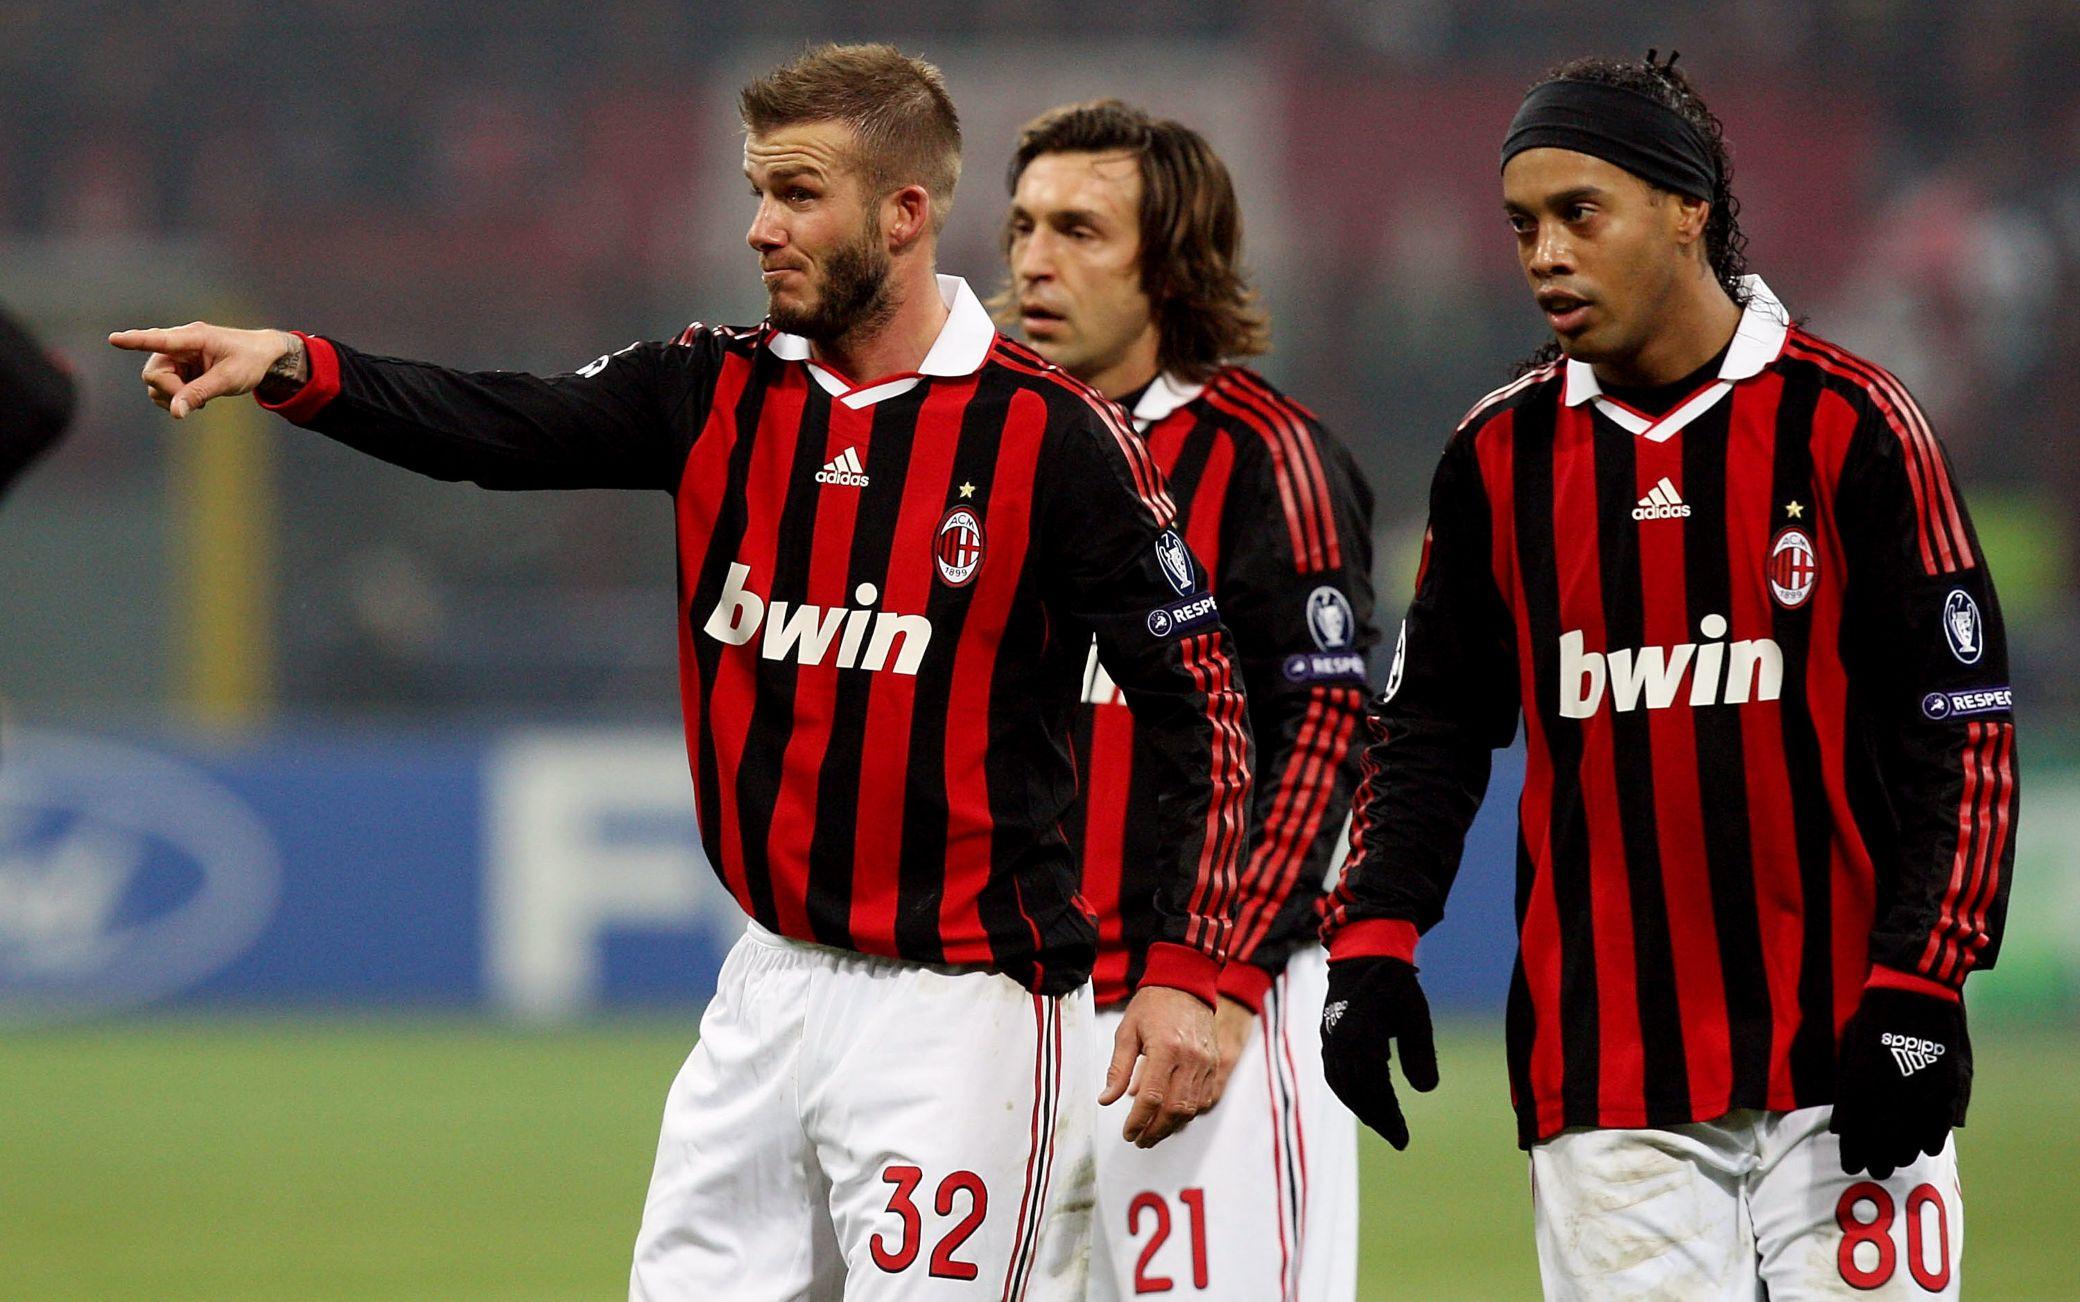 Ronaldinho al Milan con Beckham e Pirlo